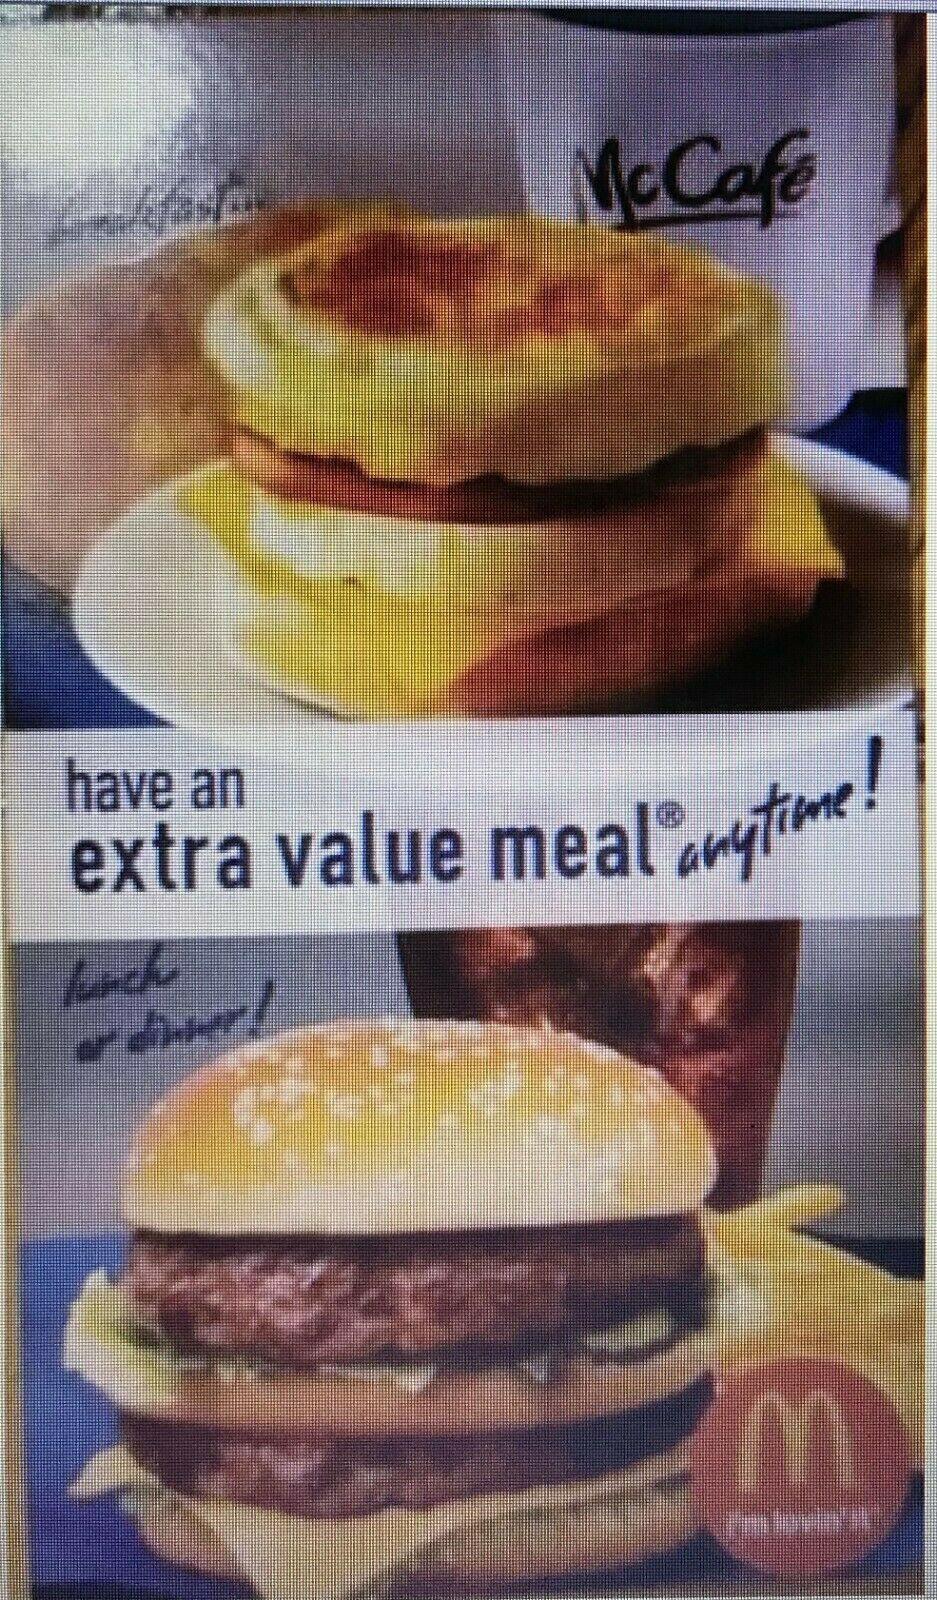 Lot Of 5 McDonalds Combo Meal Card Voucher Certificates  - $8.88